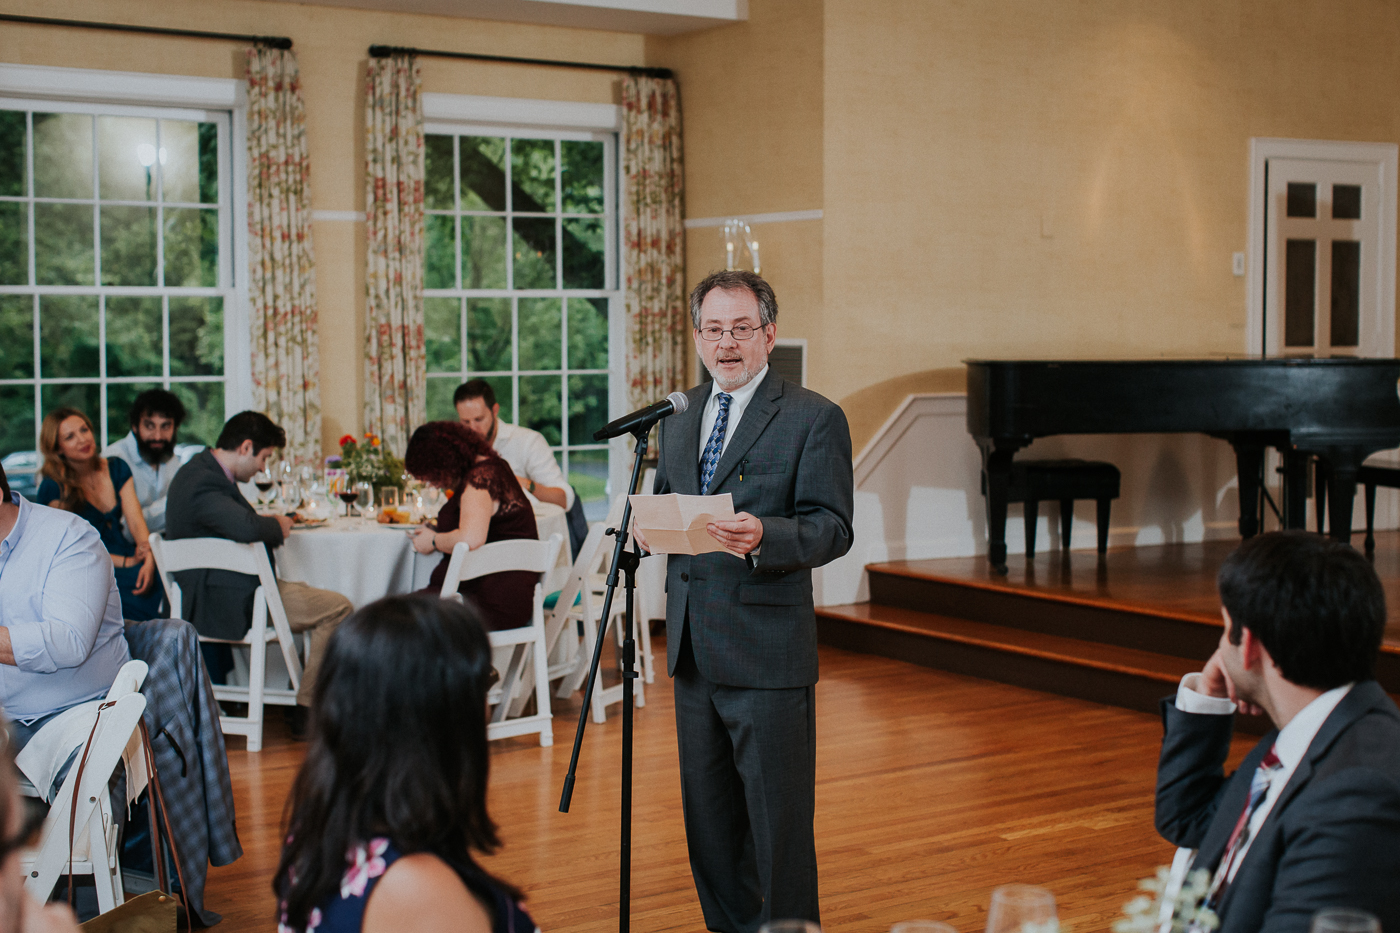 Darien-Community-Association-CT-Documentary-Wedding-Photographer-77.jpg